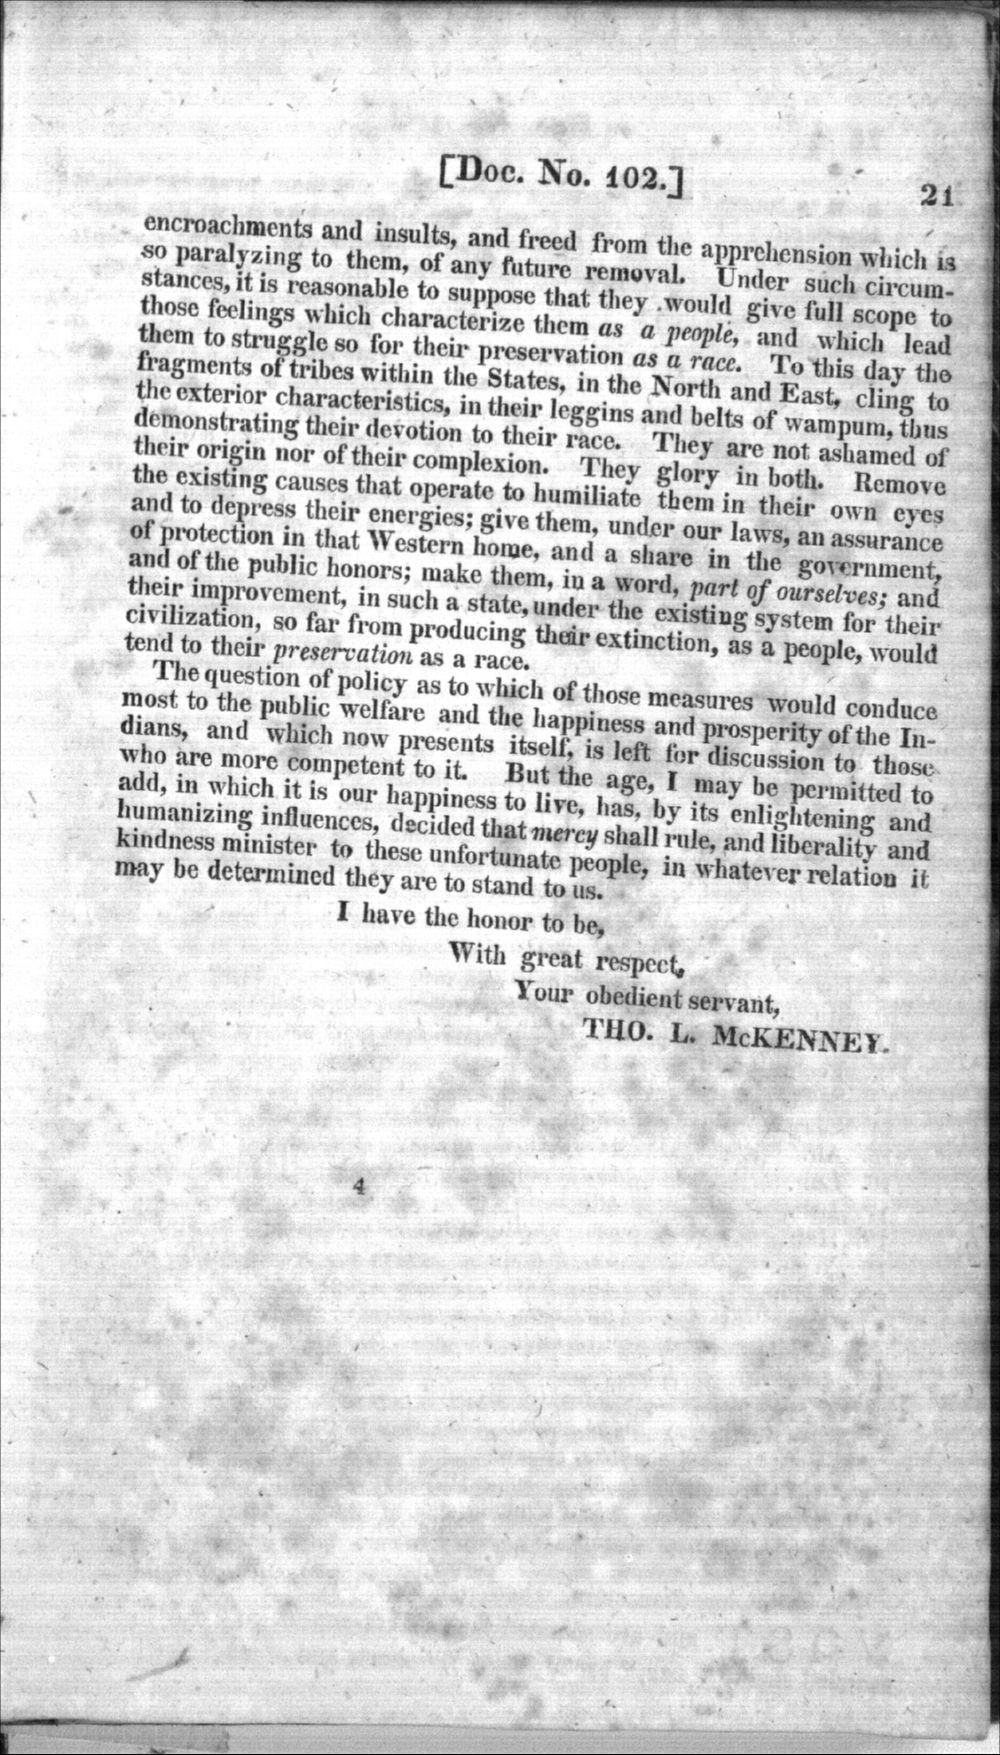 Thomas L. McKenney to James Barbour - 7